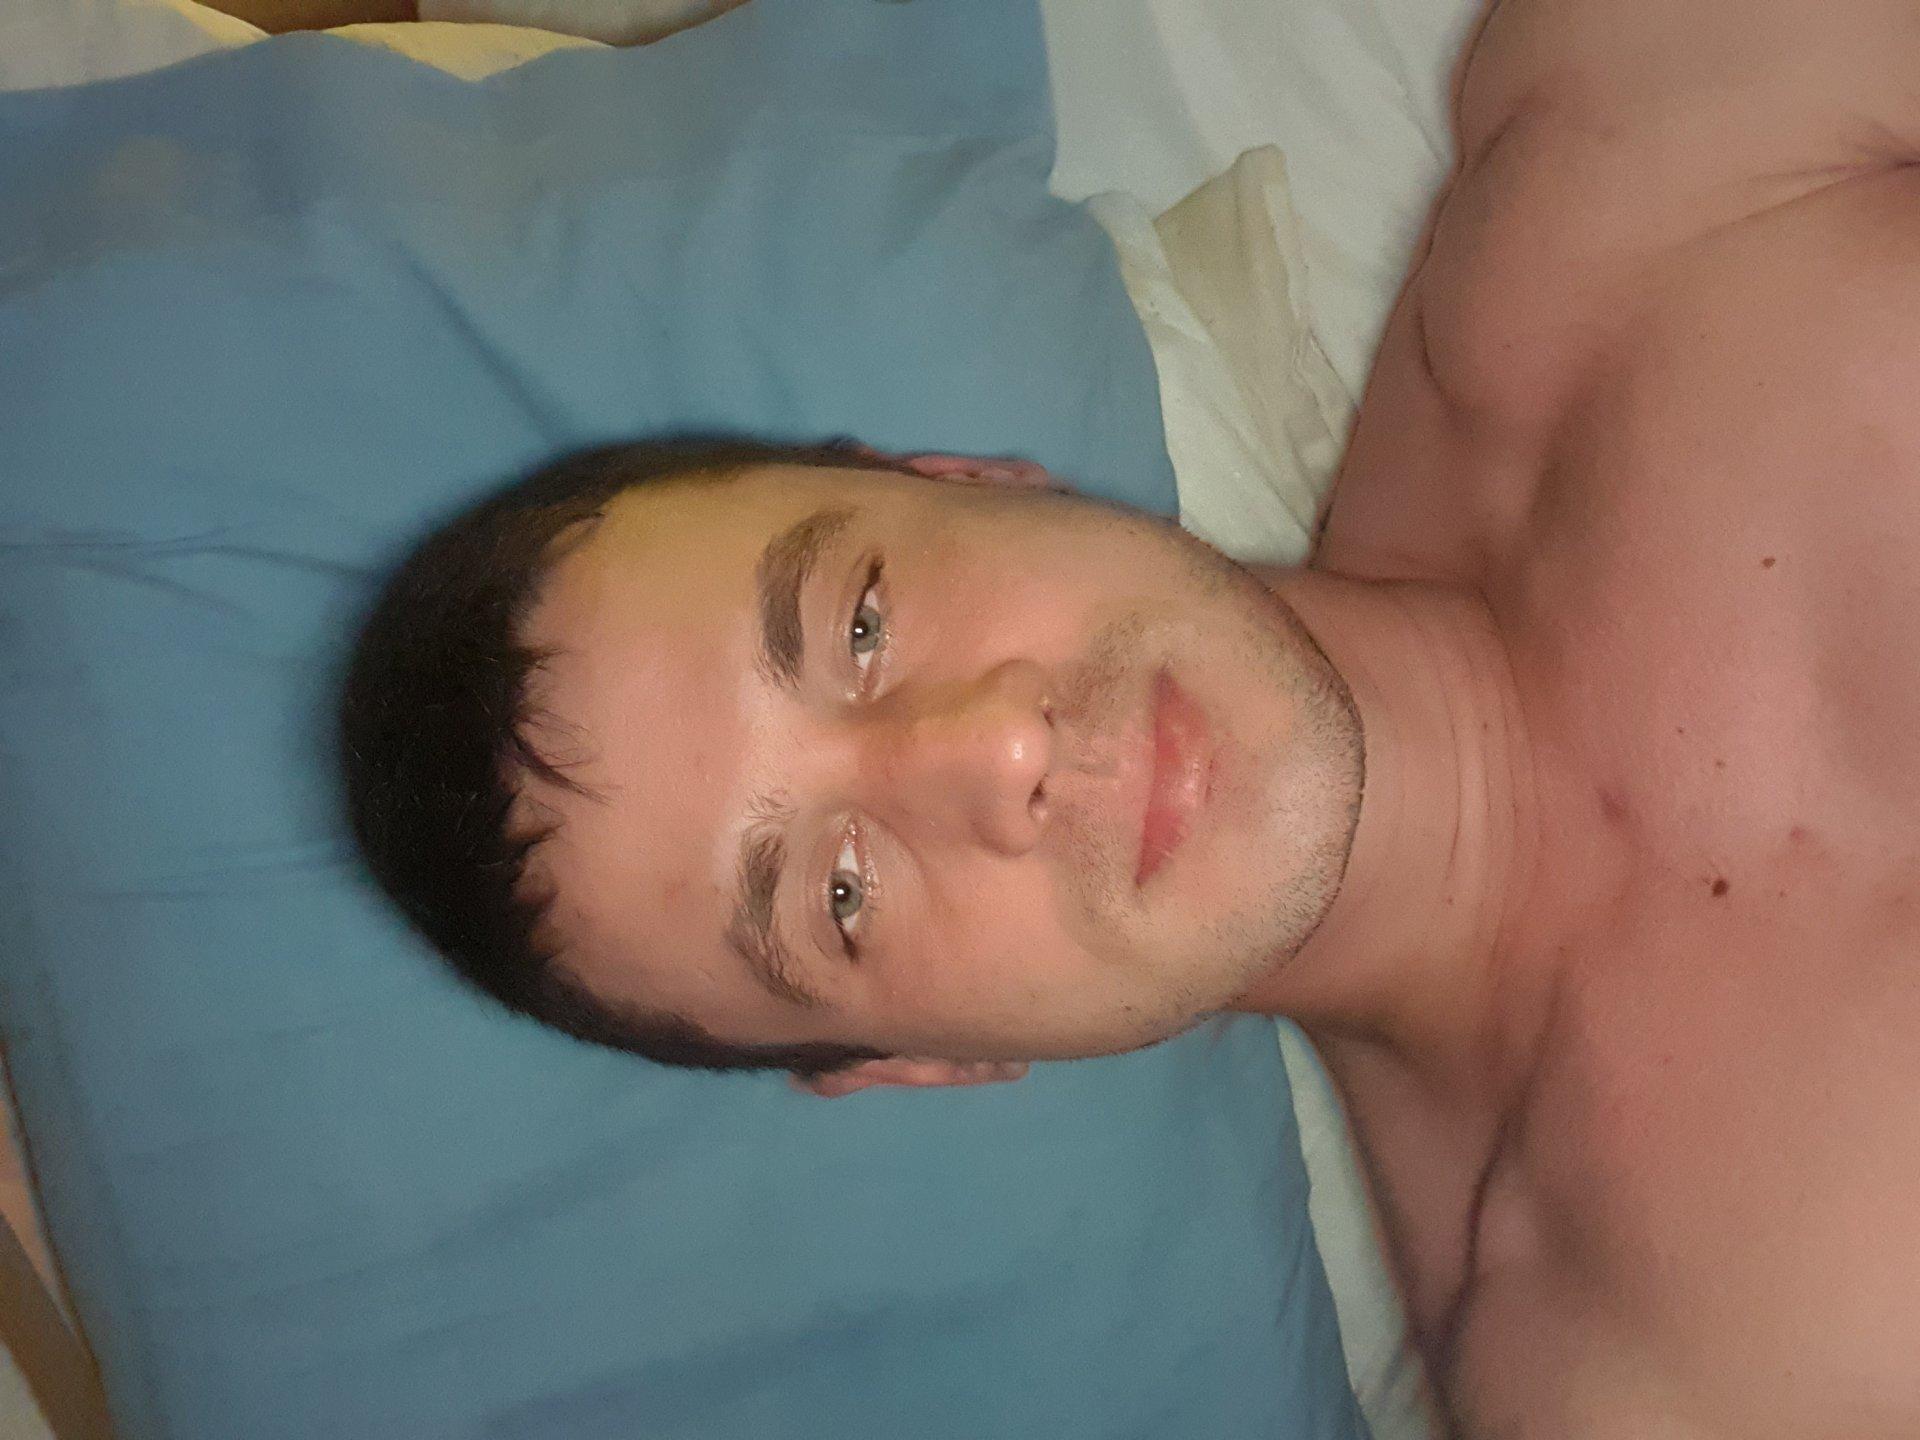 Akson113 from Leeds,United Kingdom